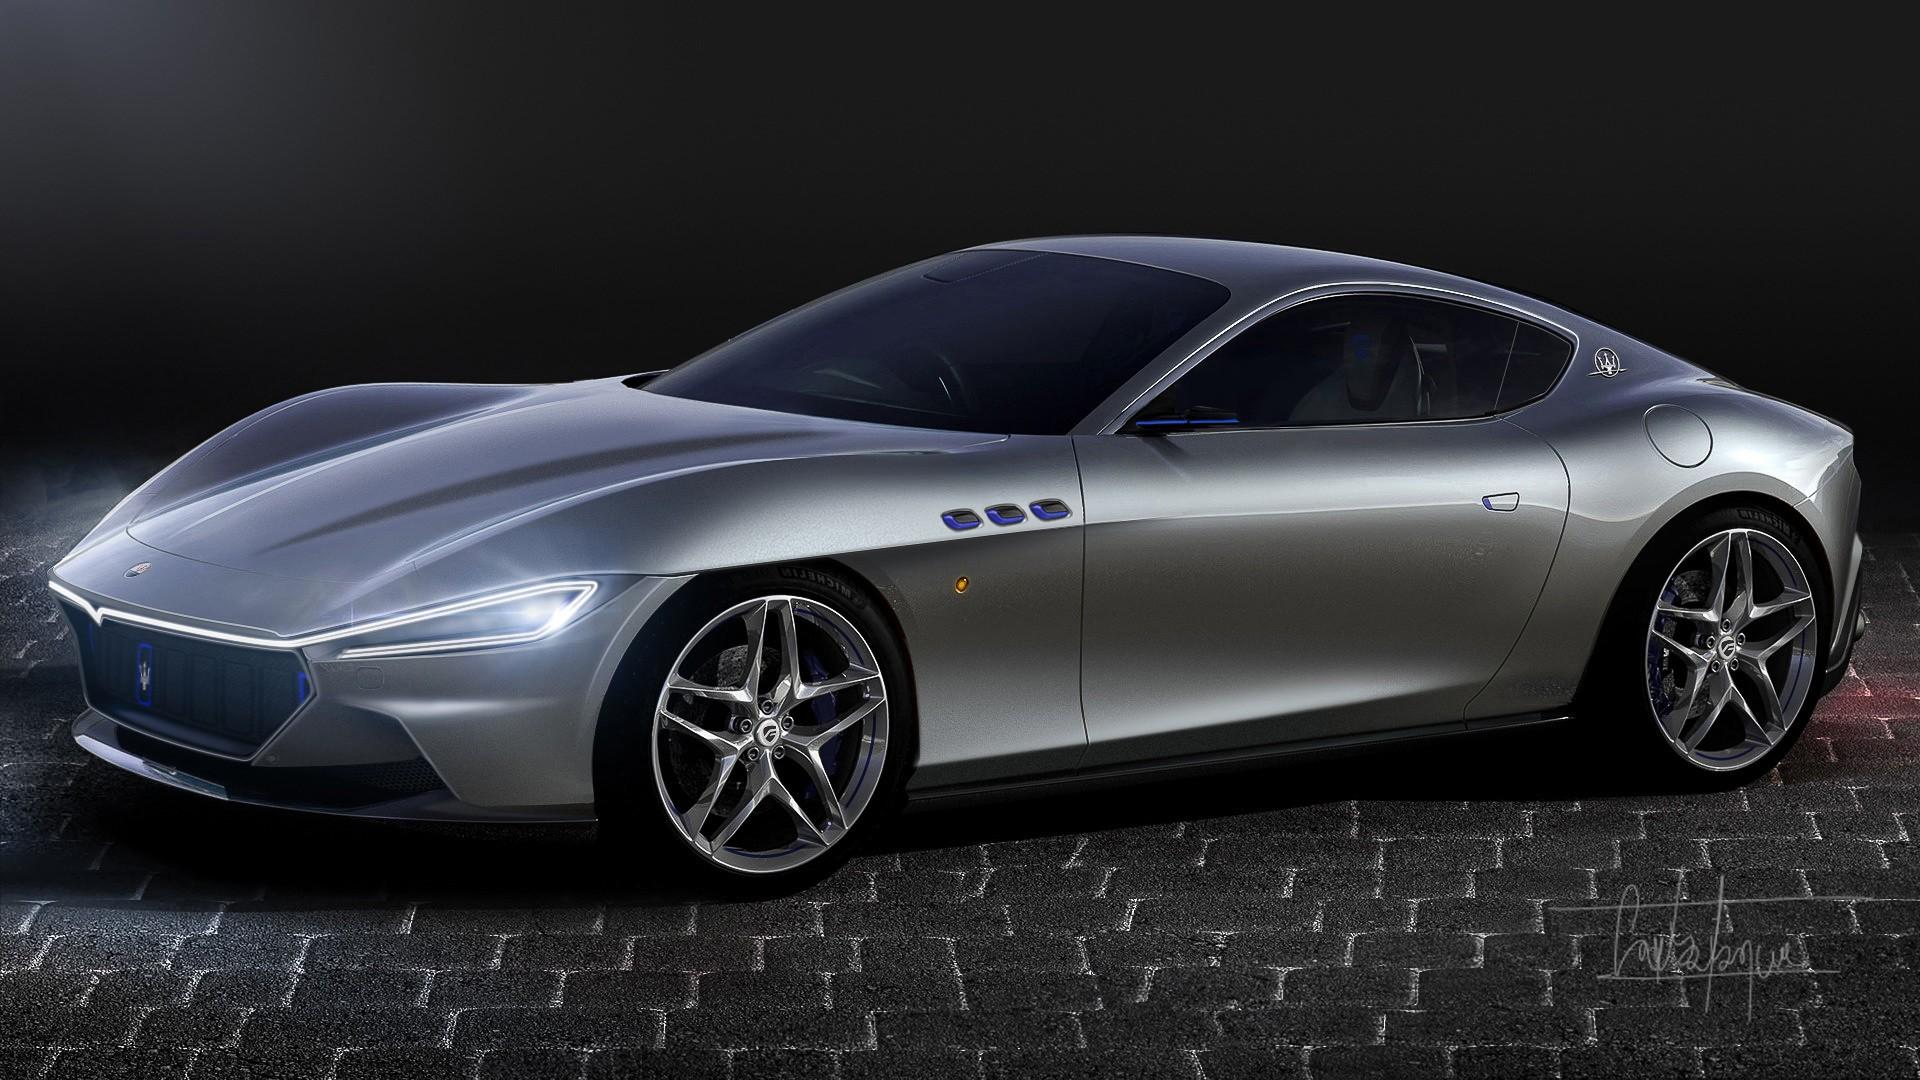 2021 - [Maserati] Alfieri Coupé - Page 2 2022-maserati-granturismo-imagined-with-ferrari-roma-styling-influences_2